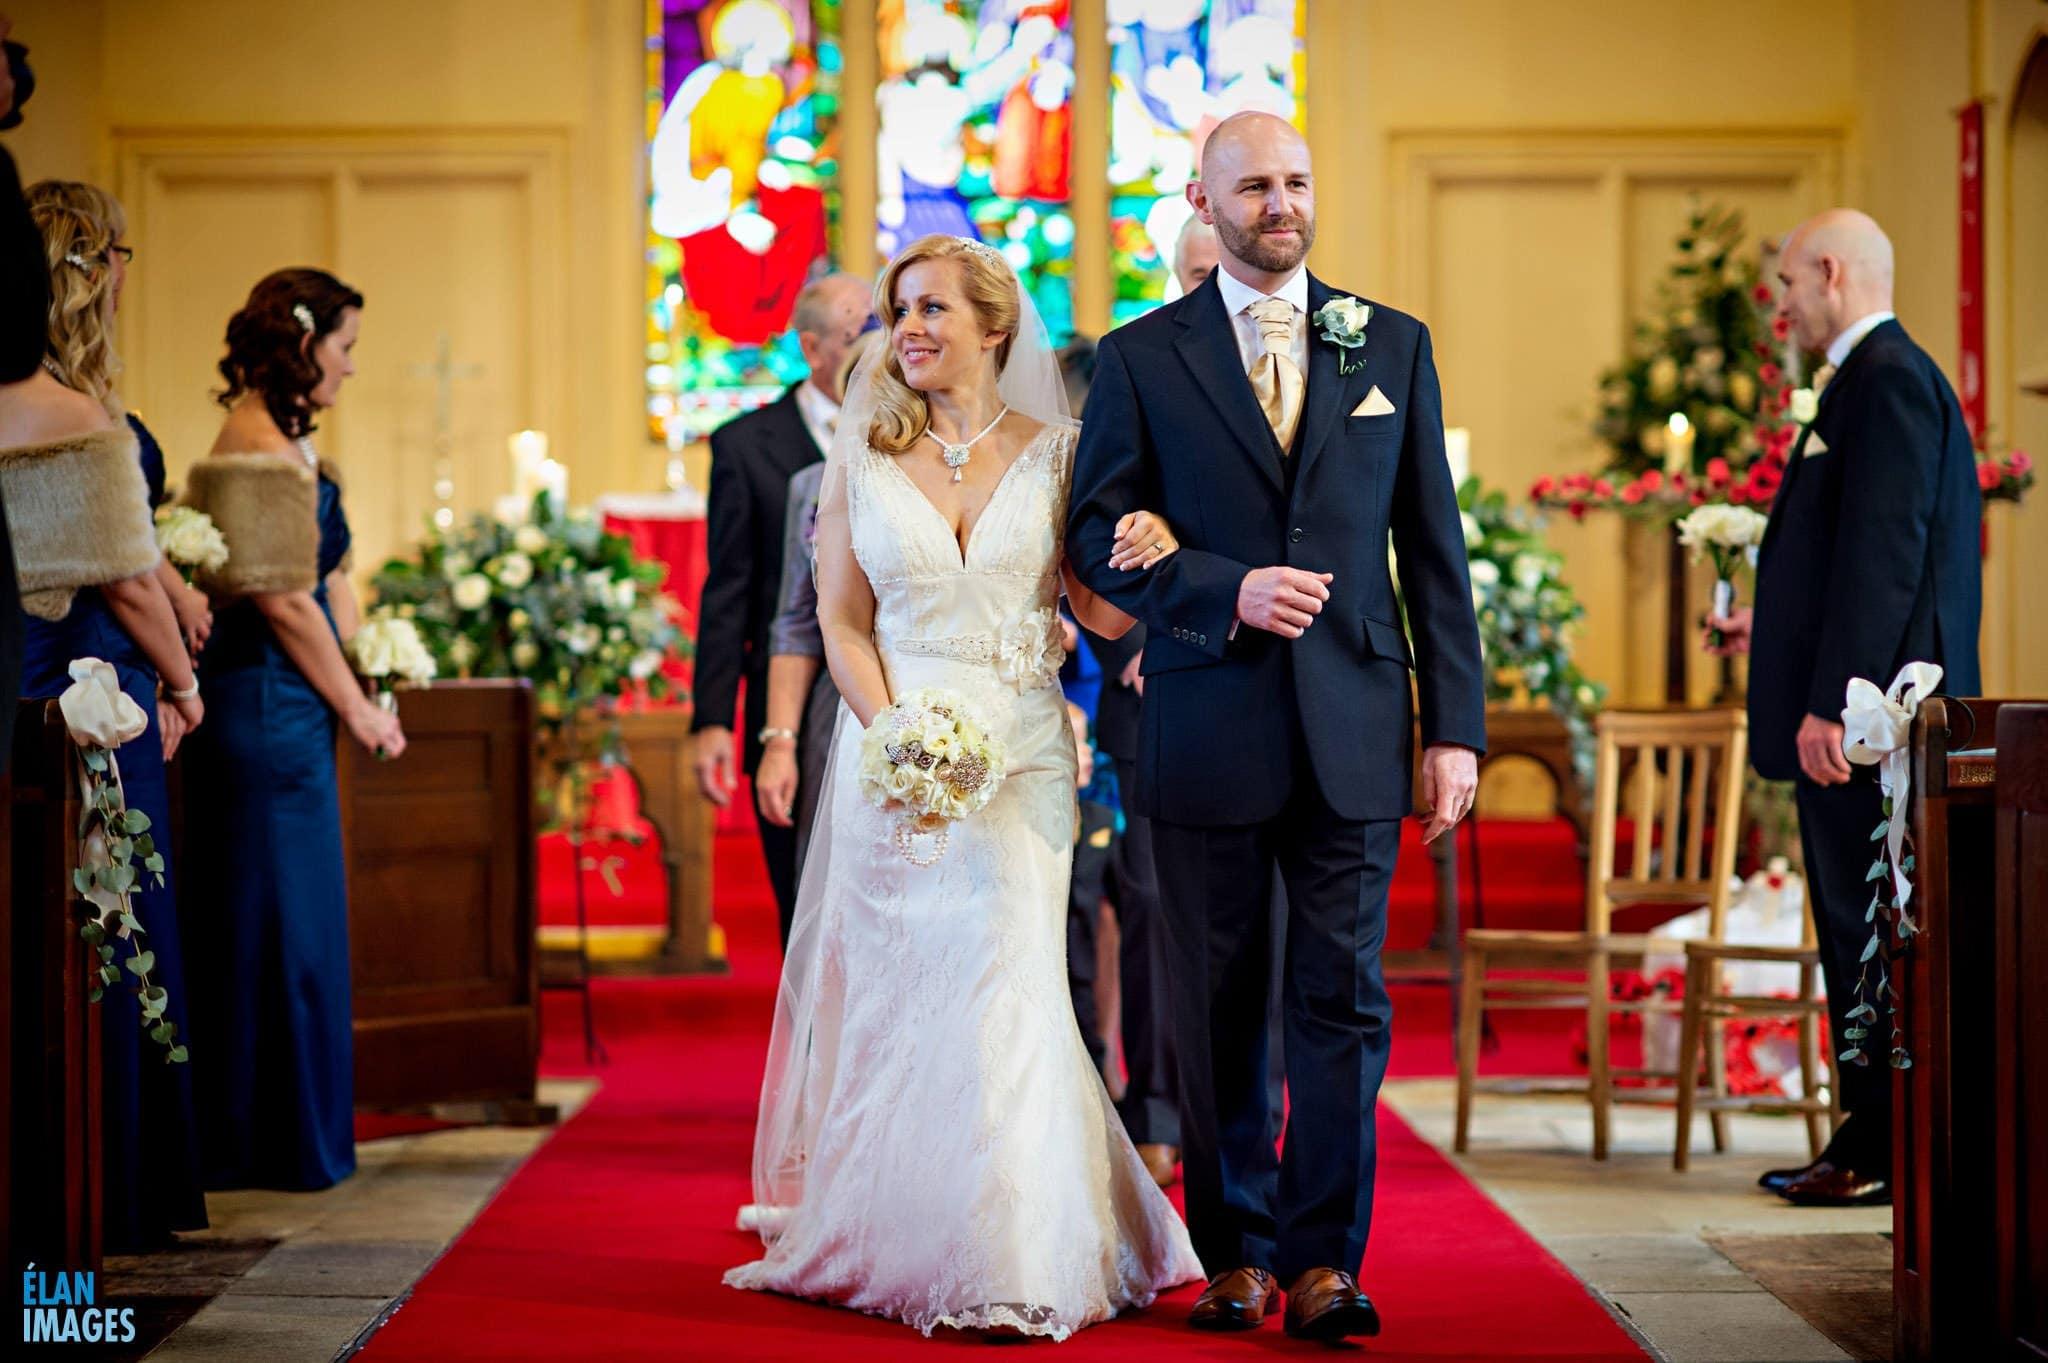 Wedding at leigh park hotel -062